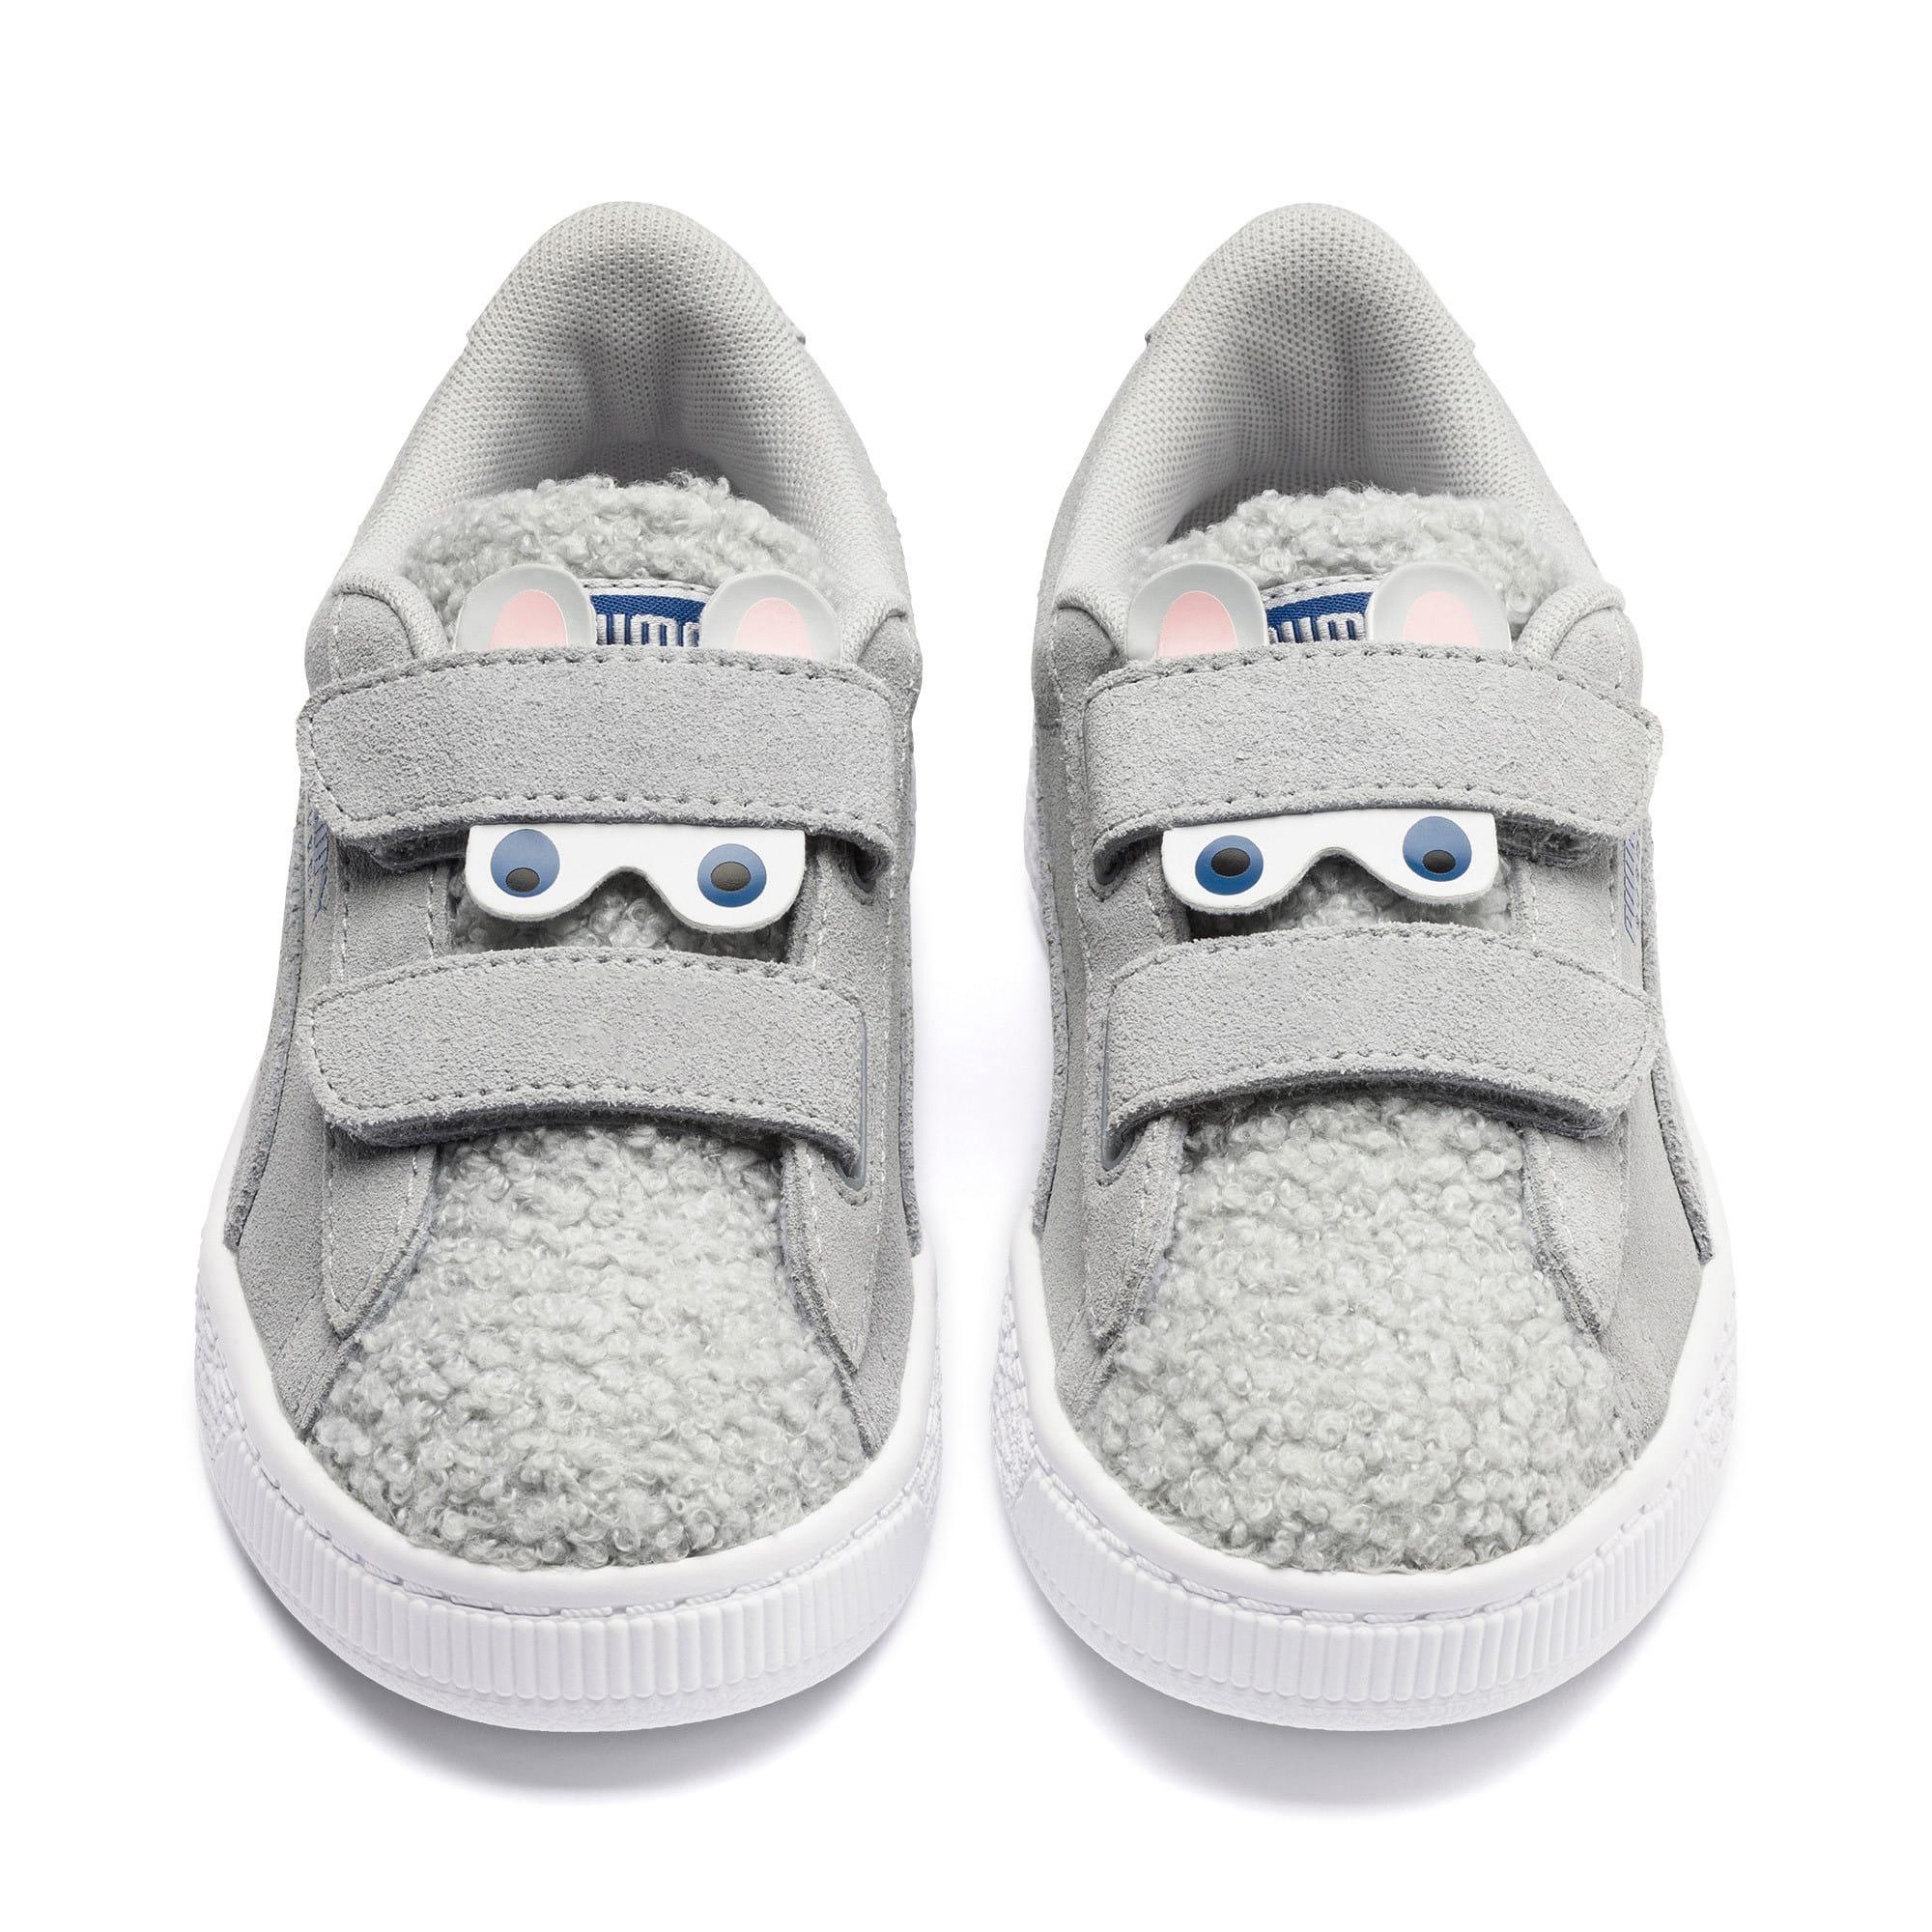 Thumbnail 7 of Suede Winter Monster Little Kids' Shoes, High Rise-Galaxy Blue, medium